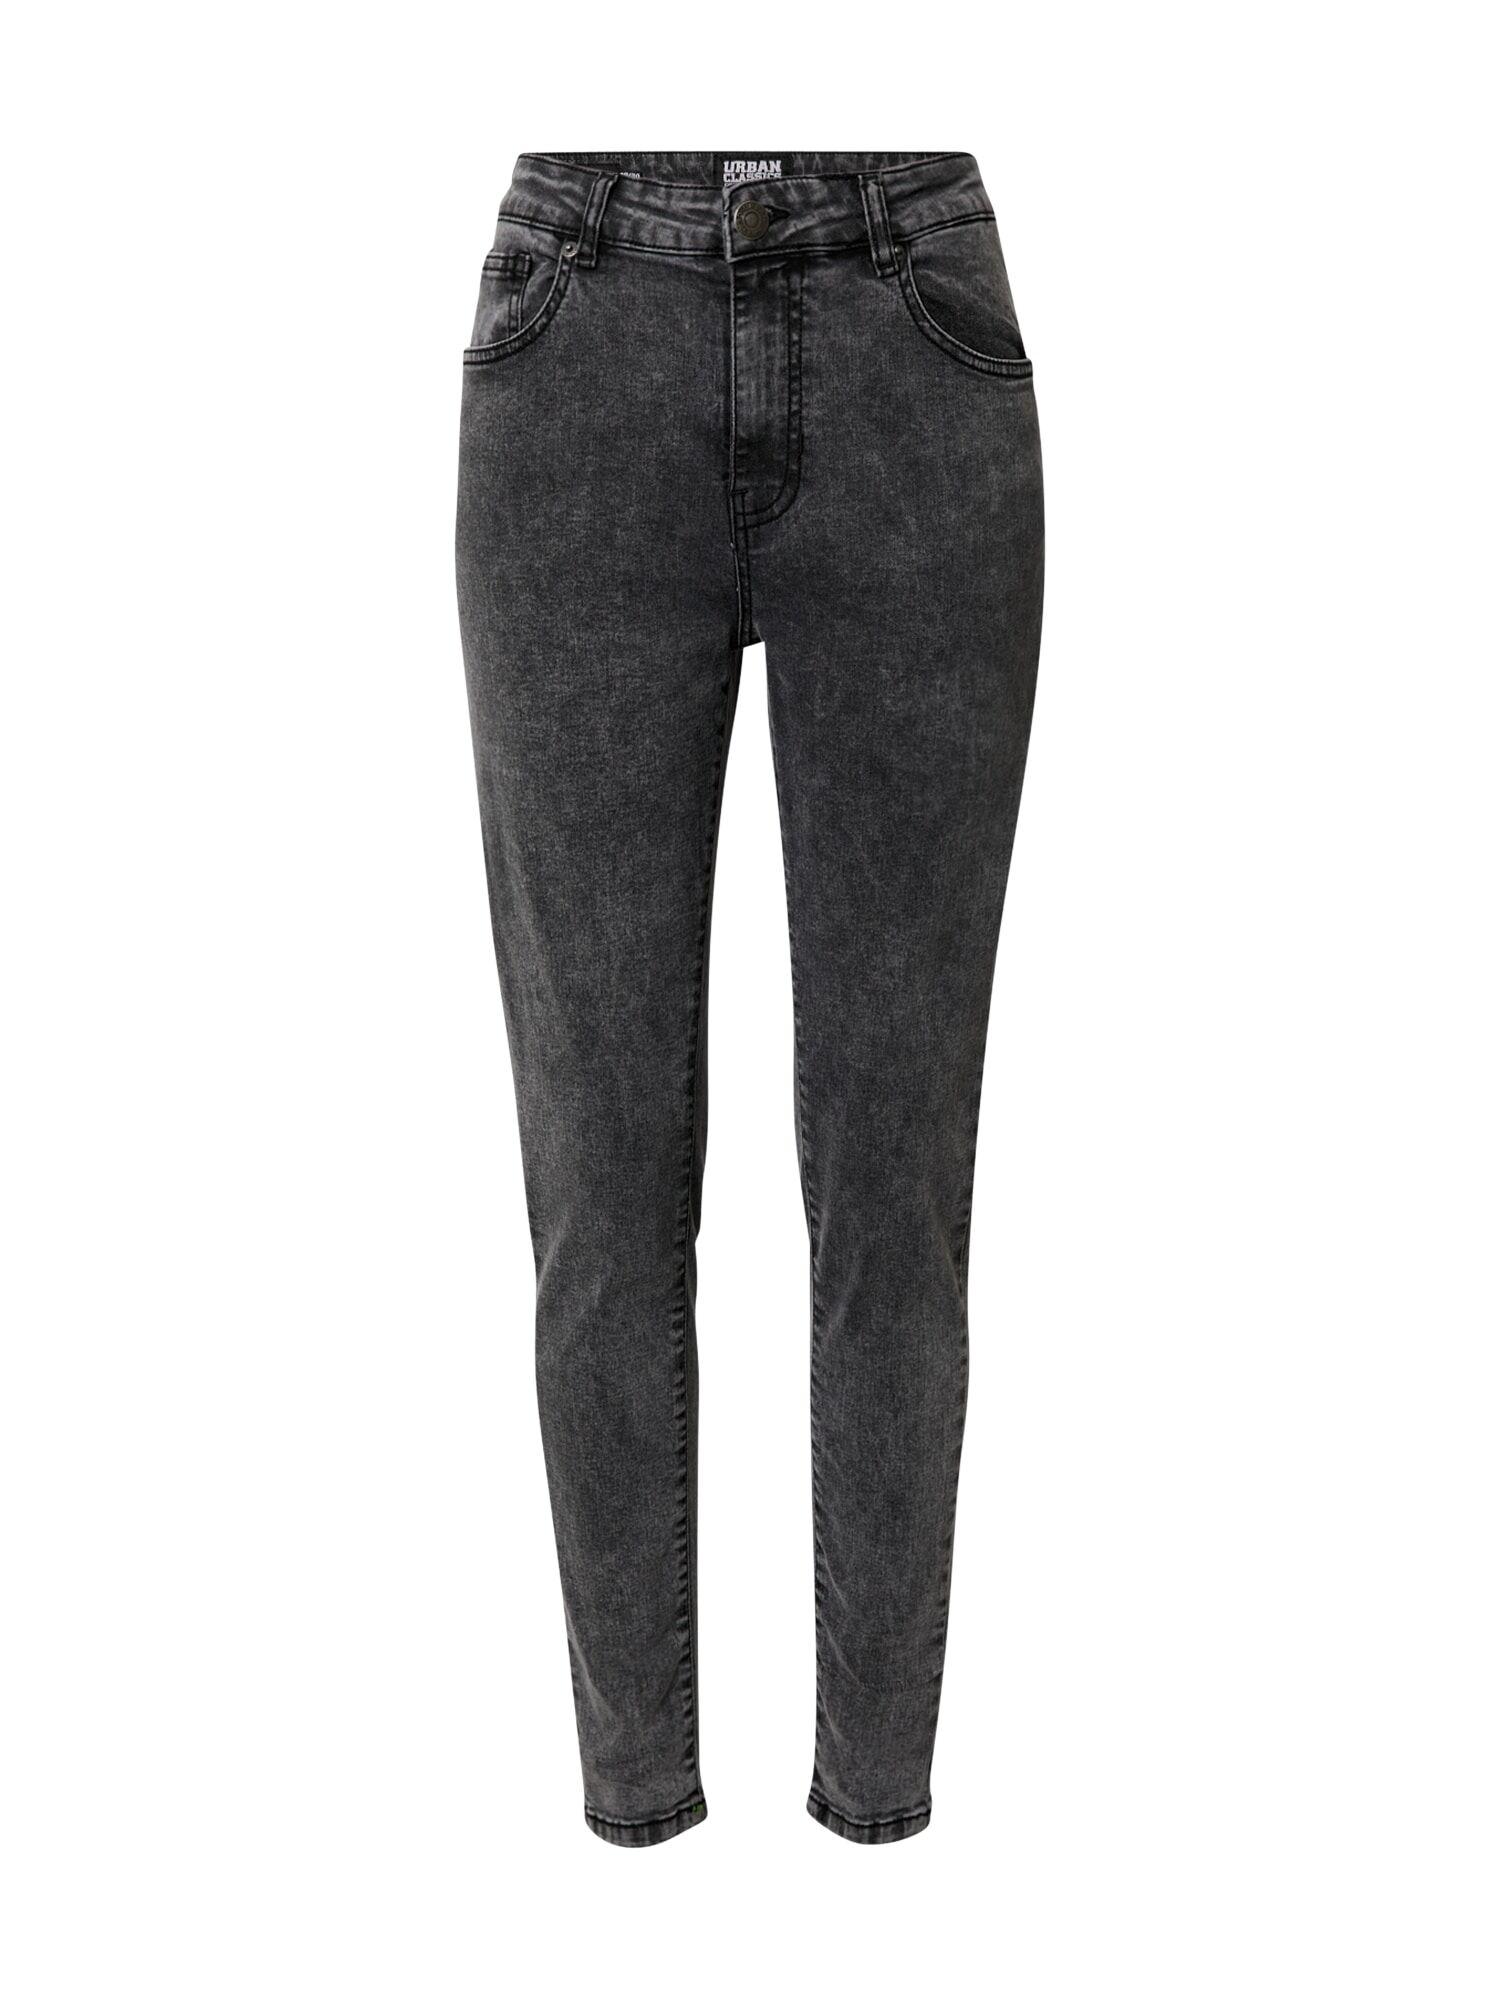 Urban Classics Jean  - Noir - Taille: 26 - female